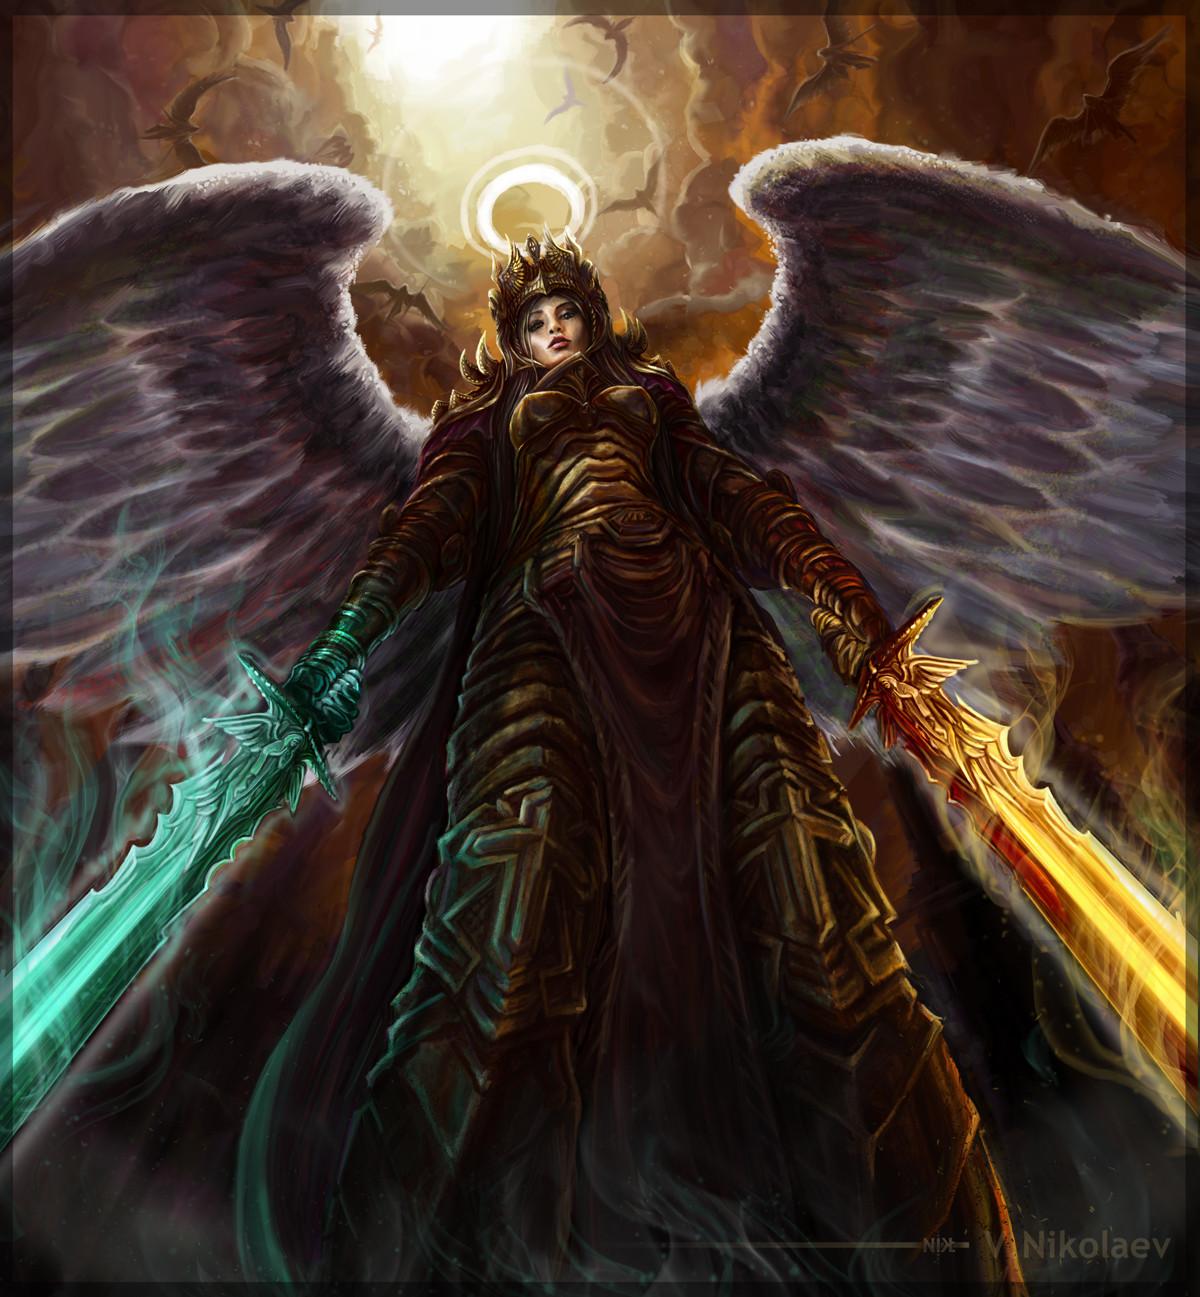 ArtStation - Captan of Angel, Vitaliy Nikolaev